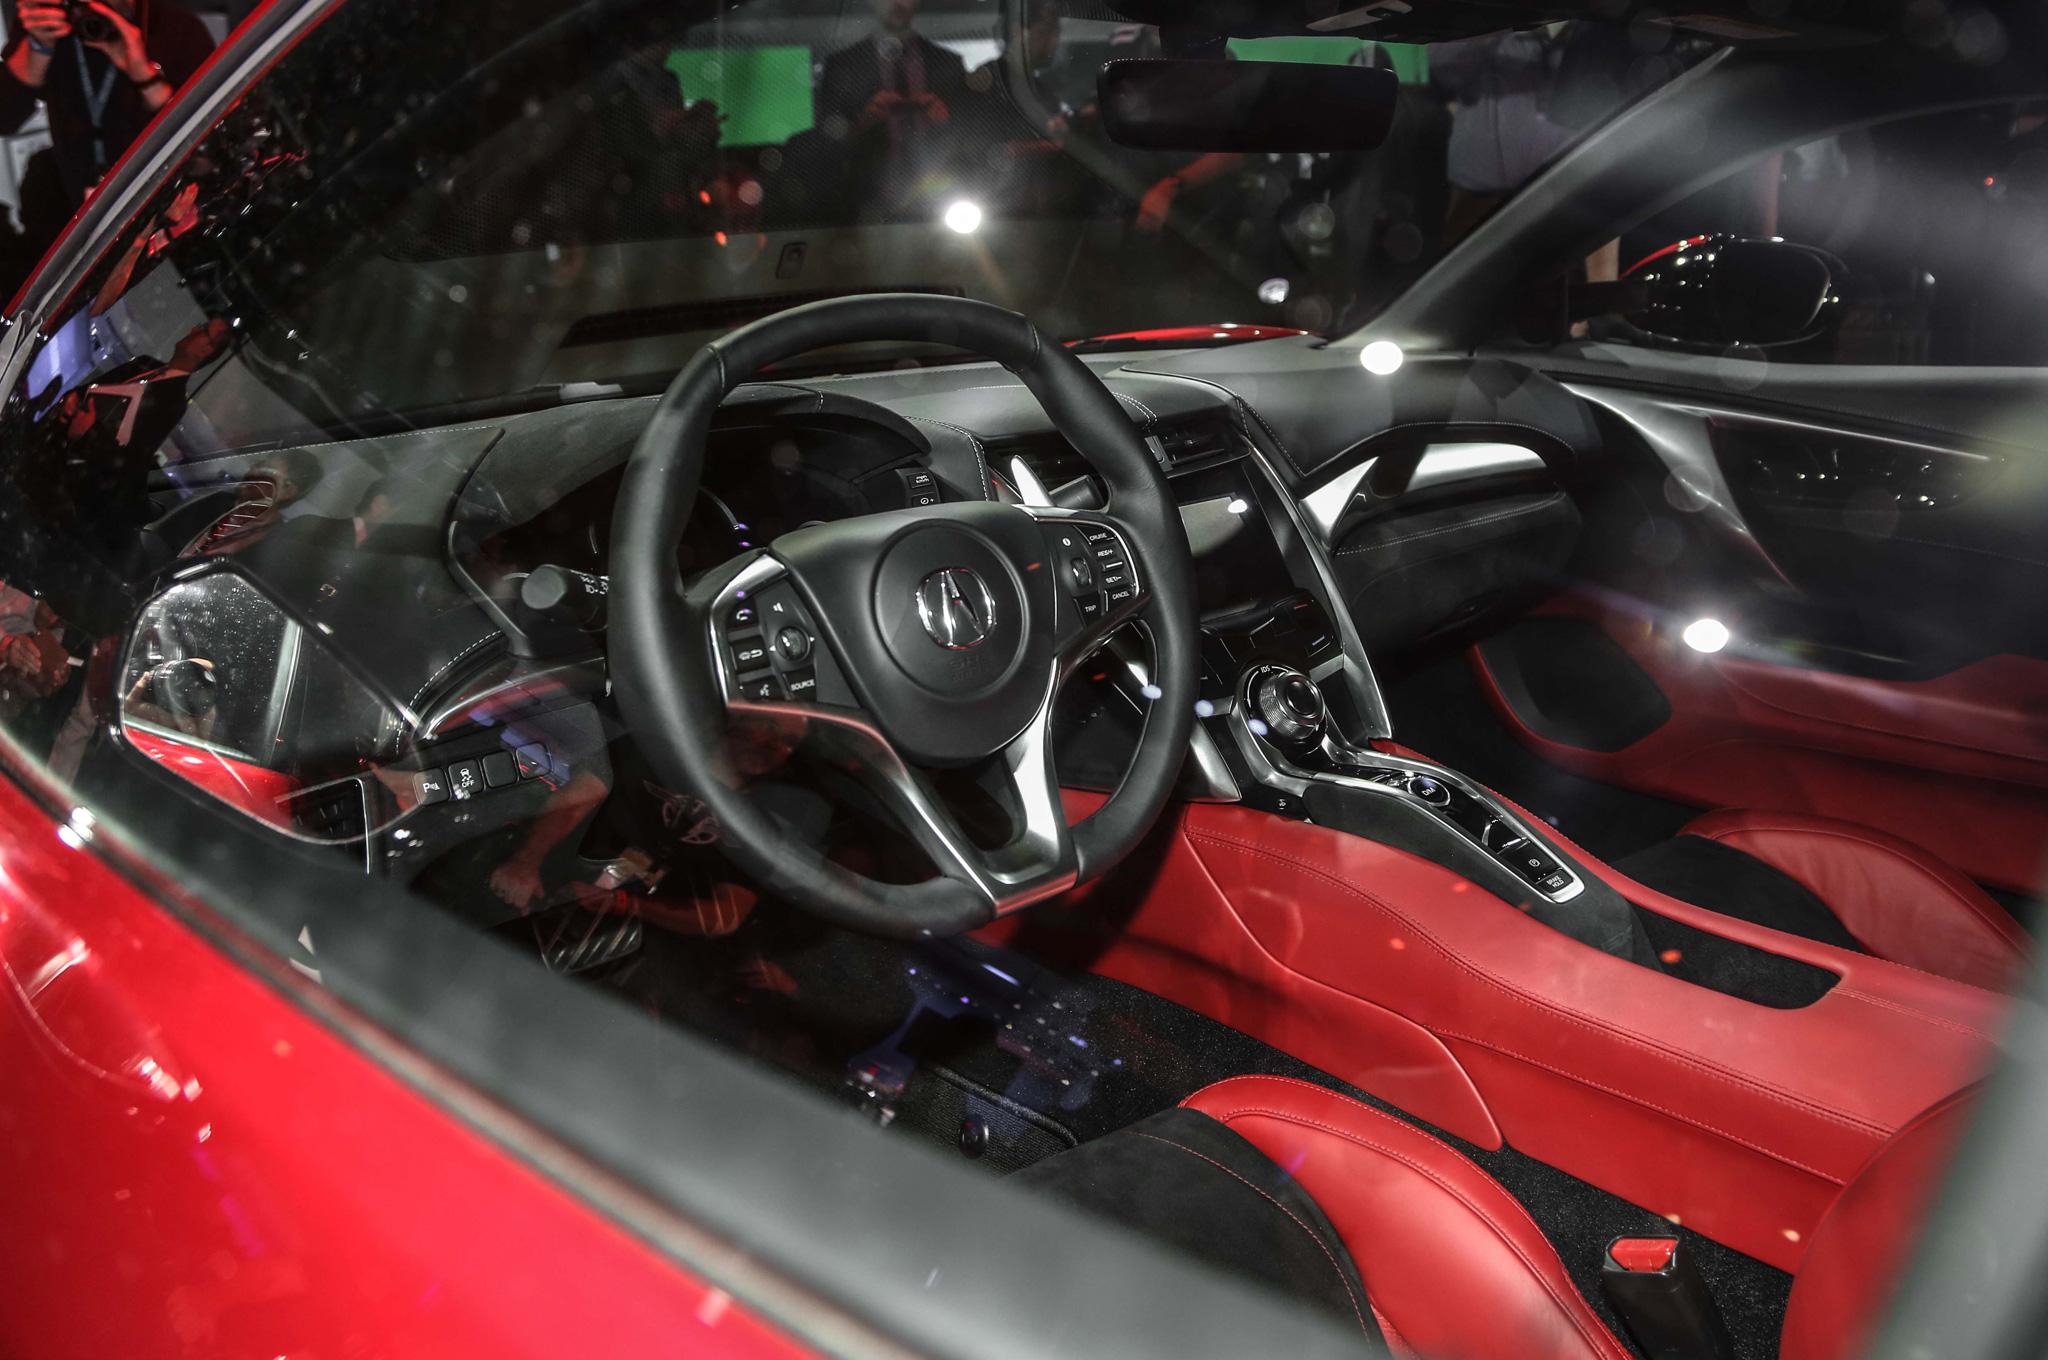 2016 Acura NSX Cockpit Photo